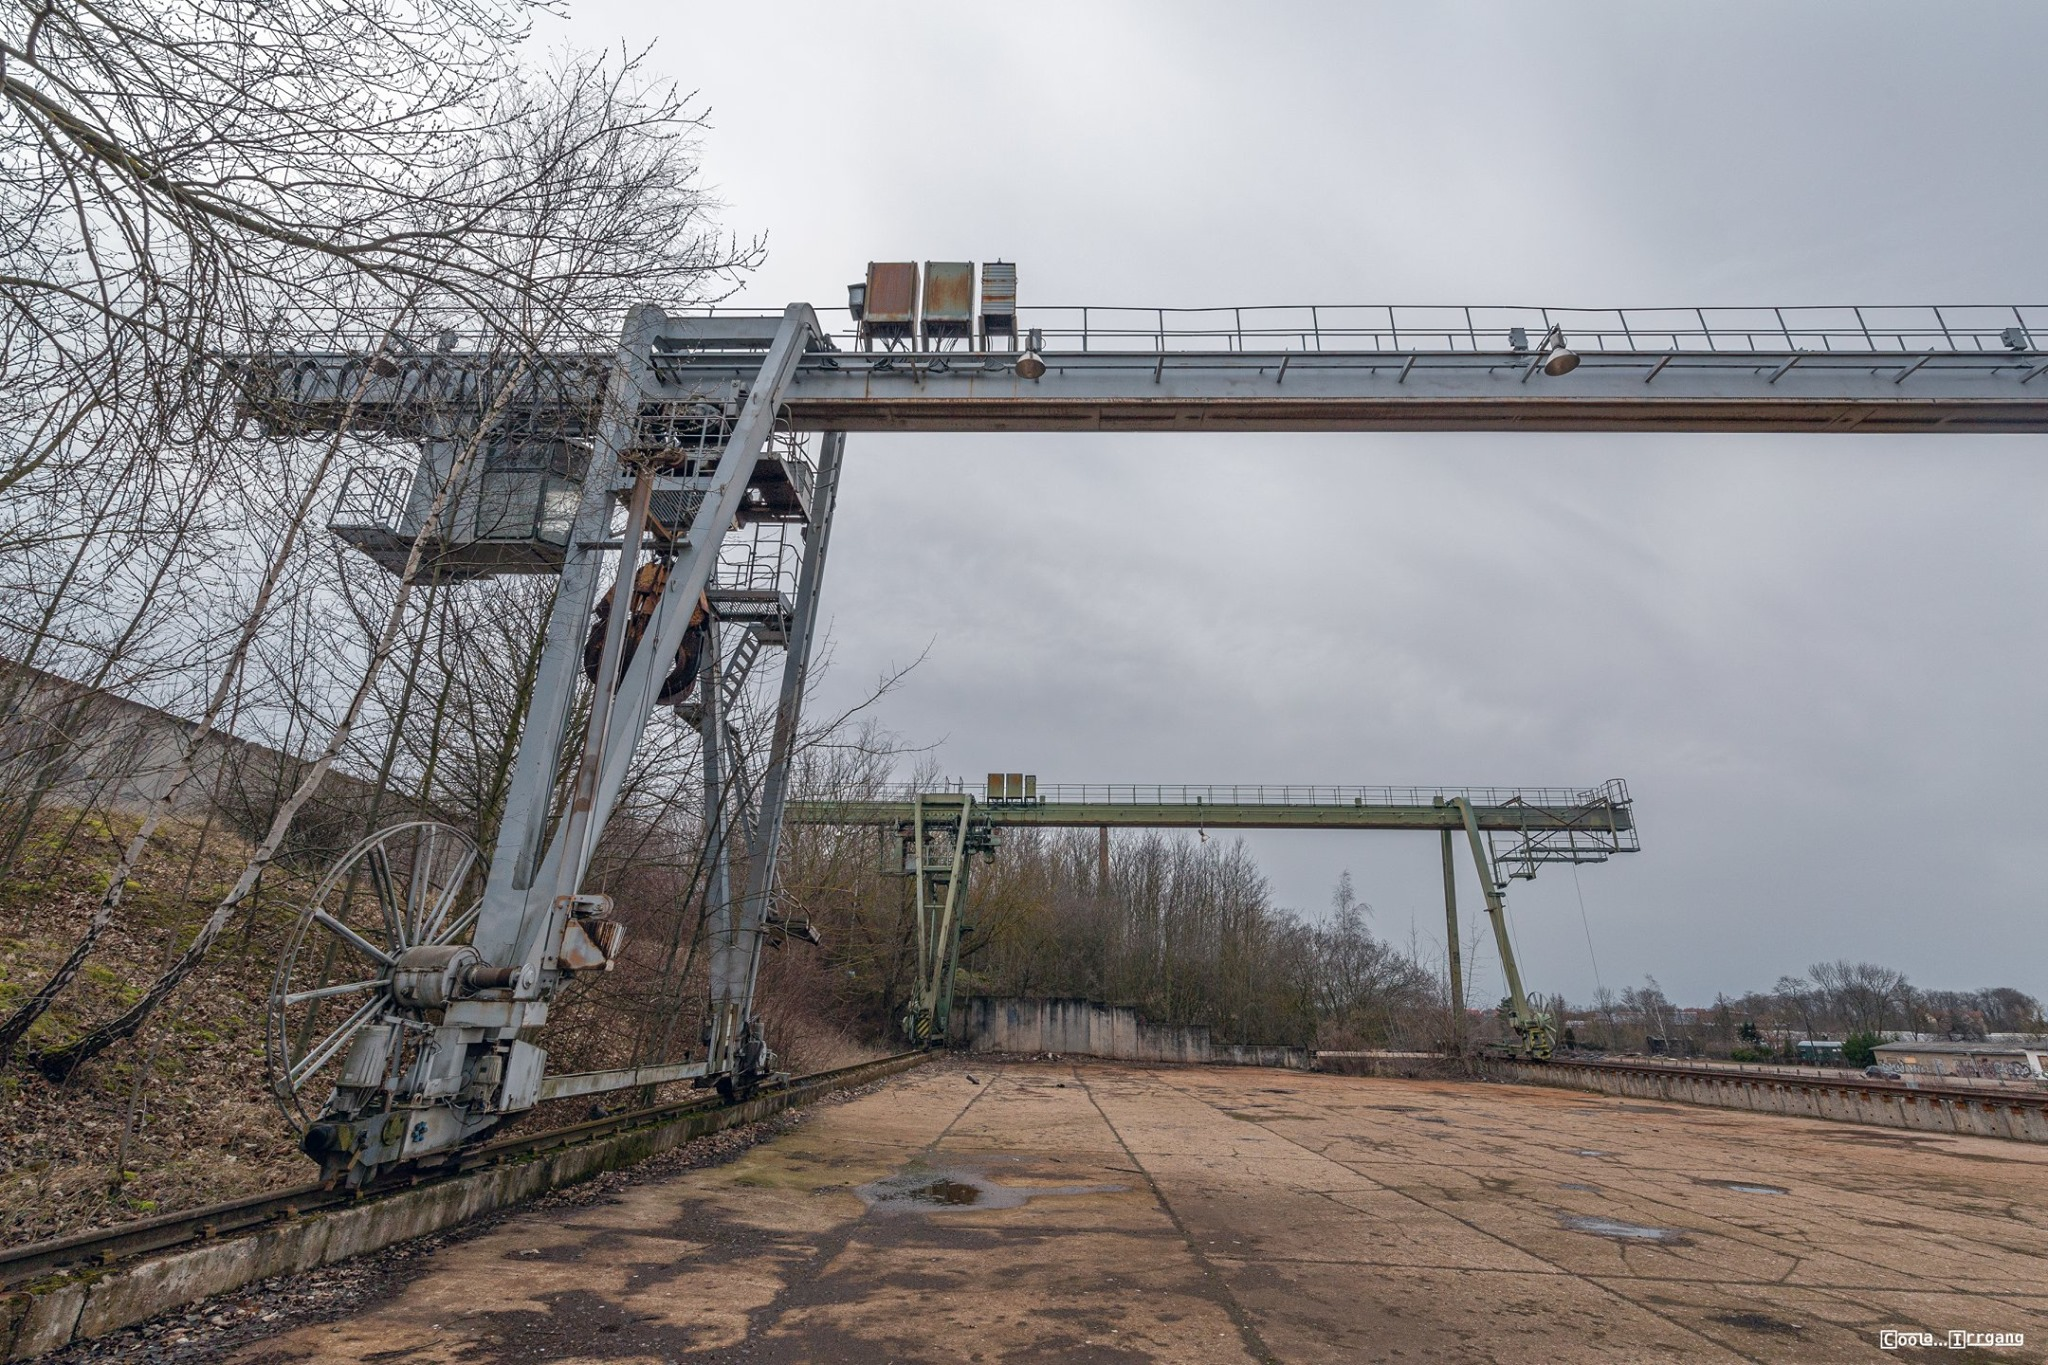 Güterabfertigung-Bad-langensalza8